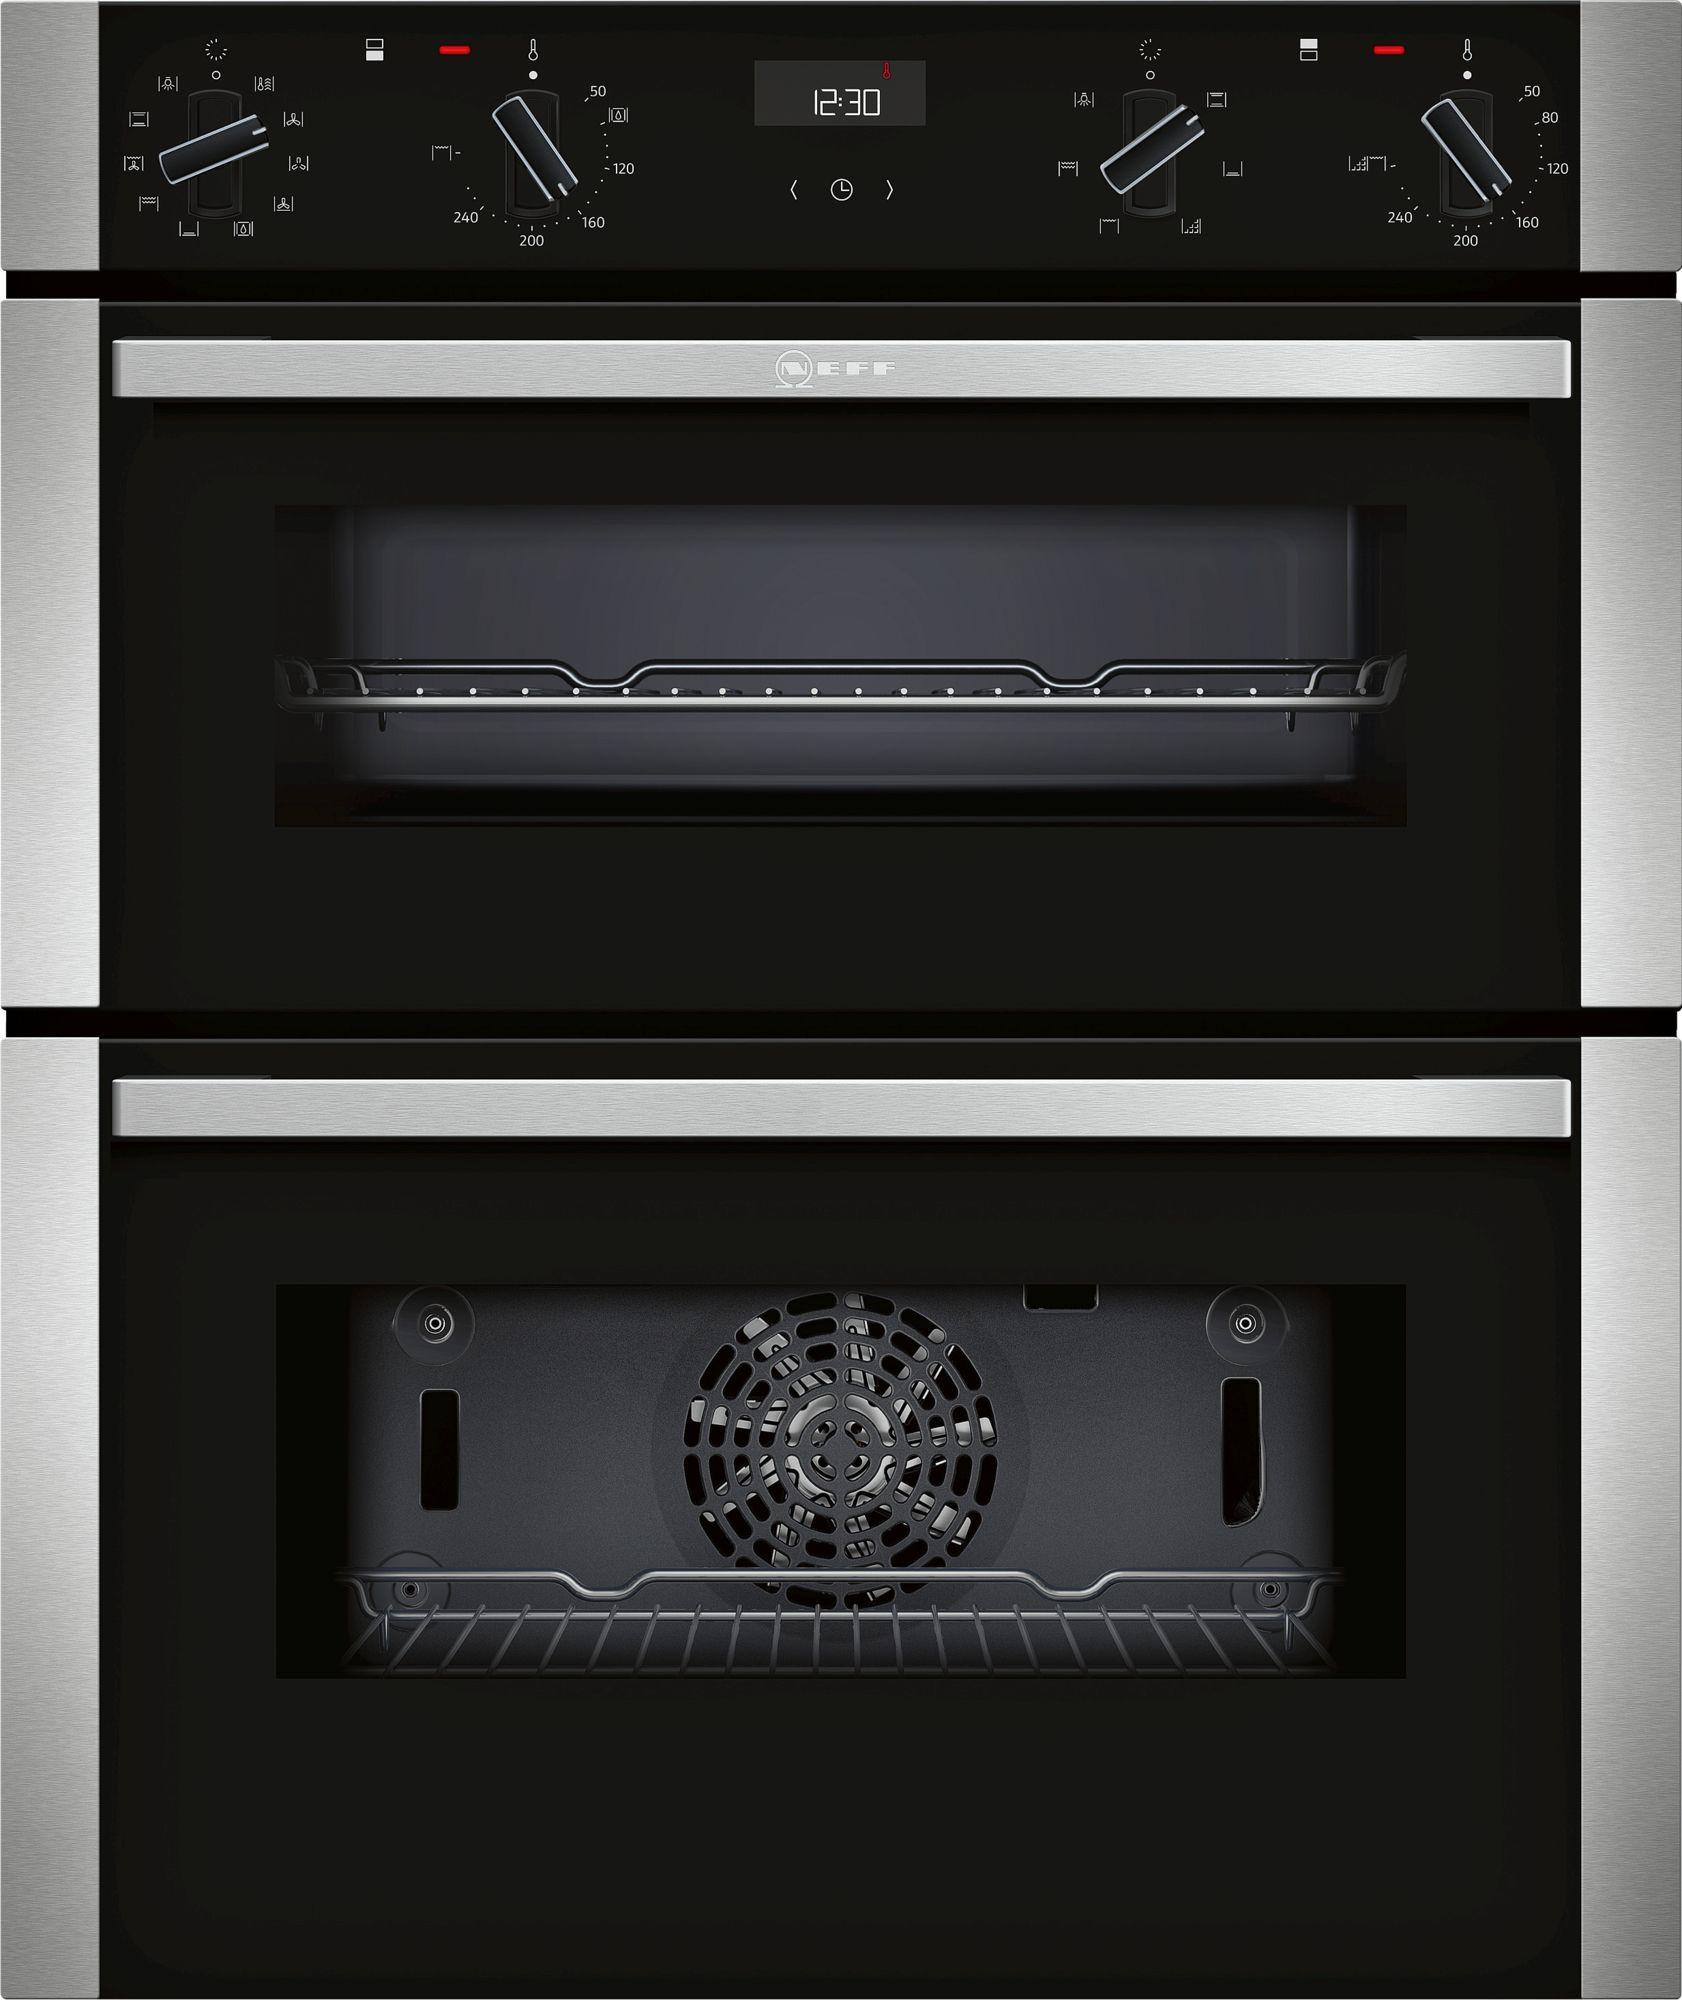 Neff N50 Black Built-Under Double Oven J1ACE4HN0B